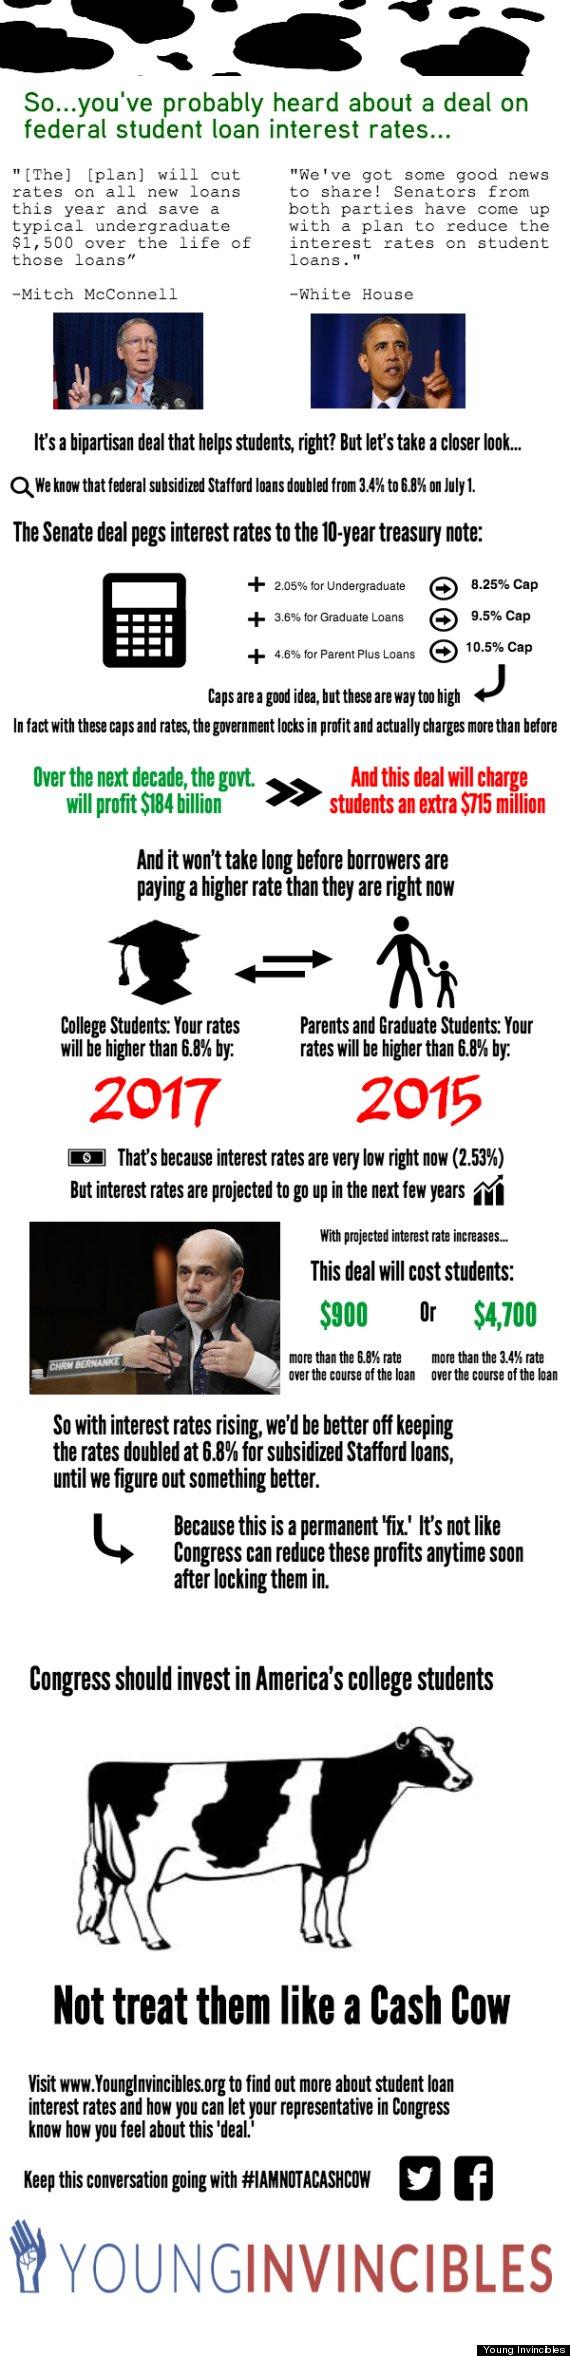 INFOGRAPHIC: Senate Deal Treats Students Like Cash Cows ...